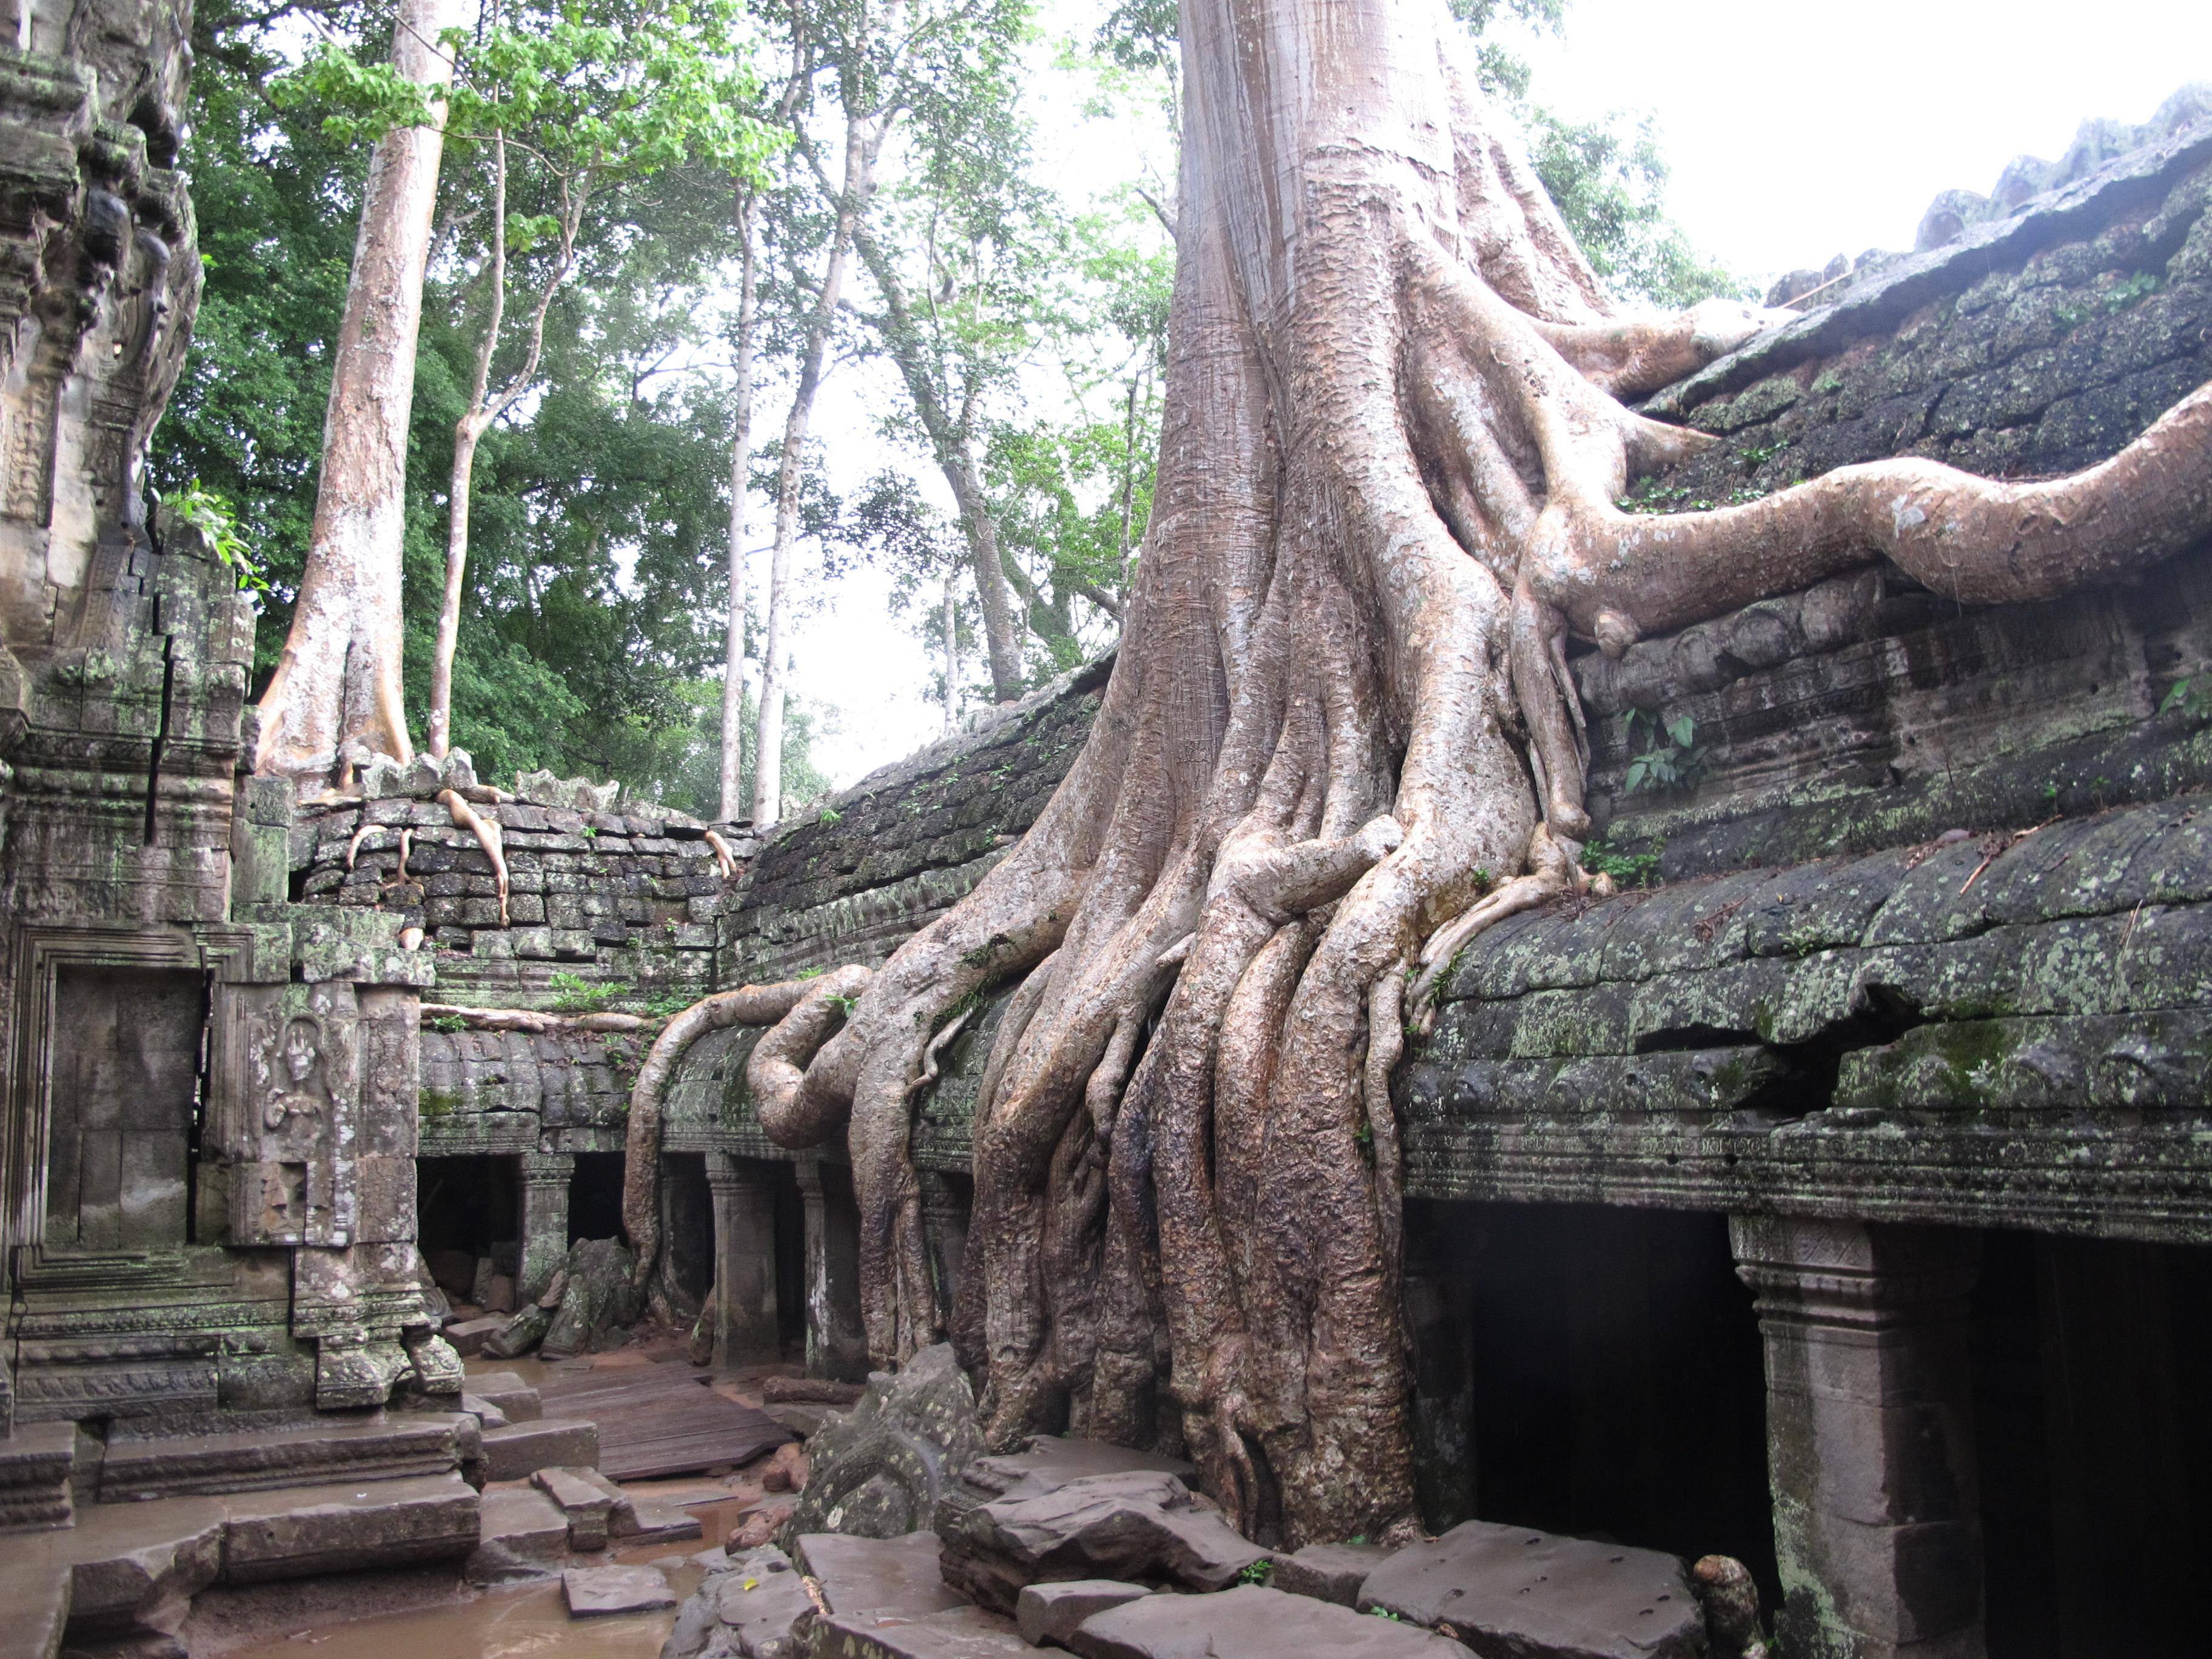 Une visite cambodge sur mesure inoubliable